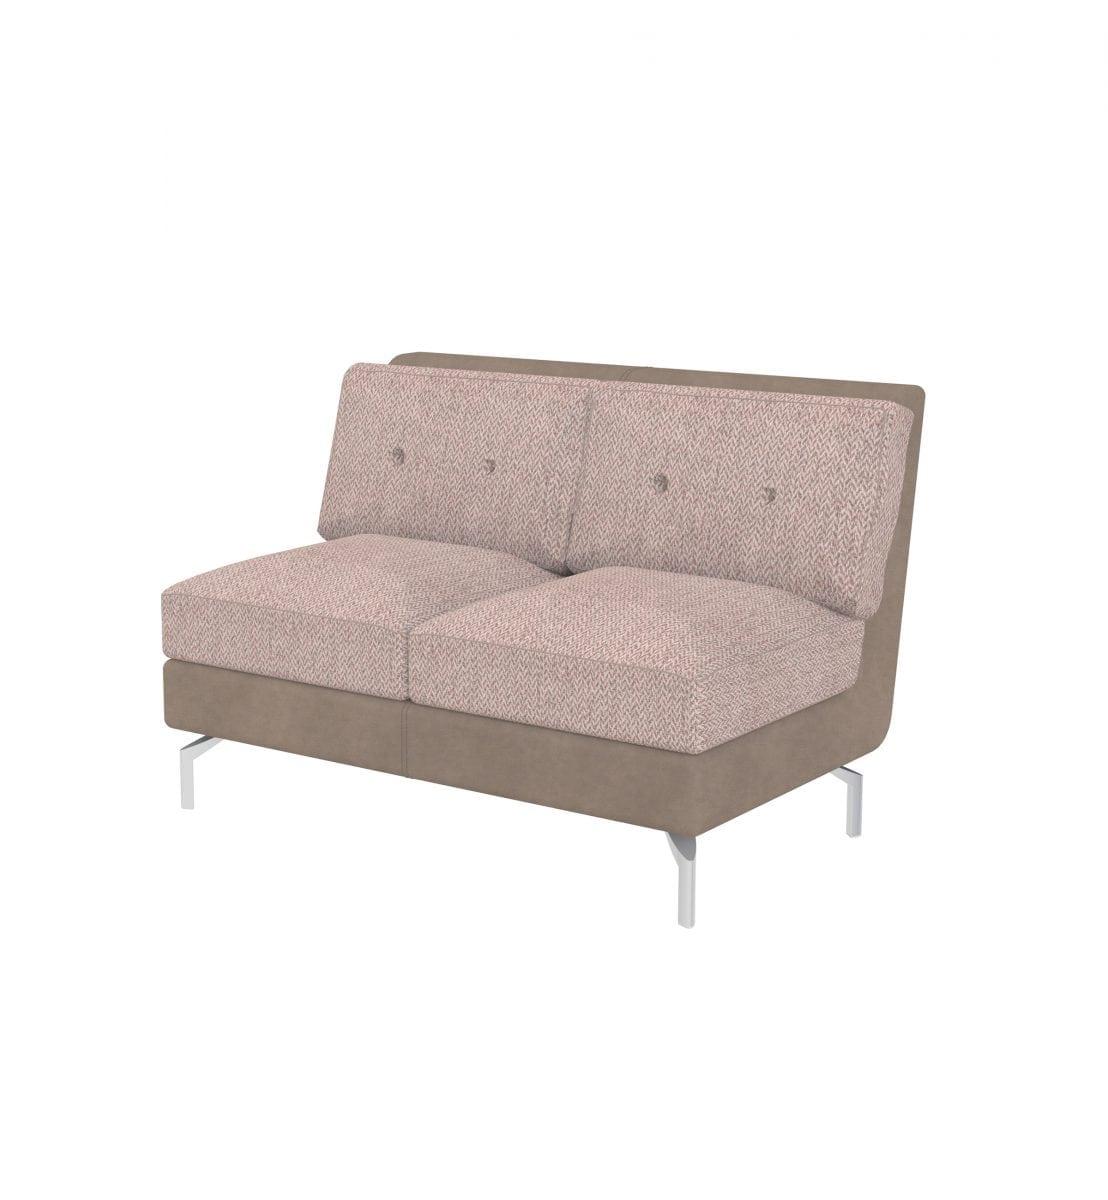 Marvelous De2 Deco Two Seater Tuxedo Style Modular Sofa Summit Chairs Customarchery Wood Chair Design Ideas Customarcherynet